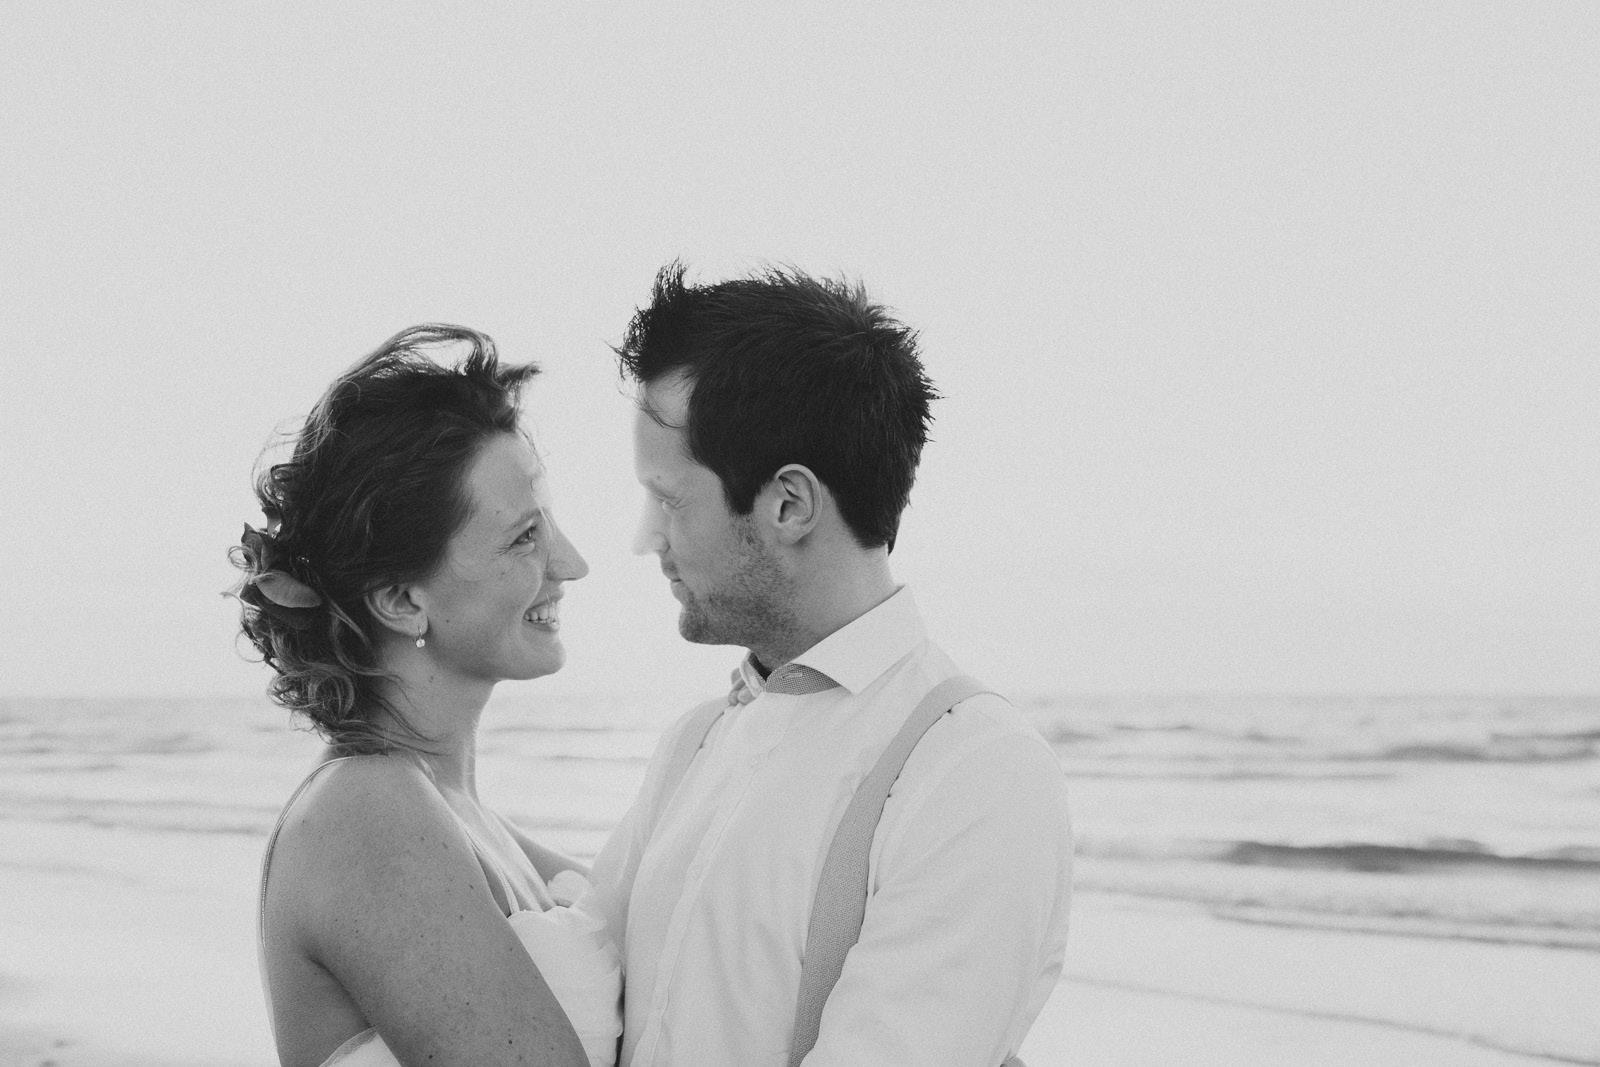 Evabloem_trouwen-sint-joris-doele_strandpaviljoen-zuid-81.jpg